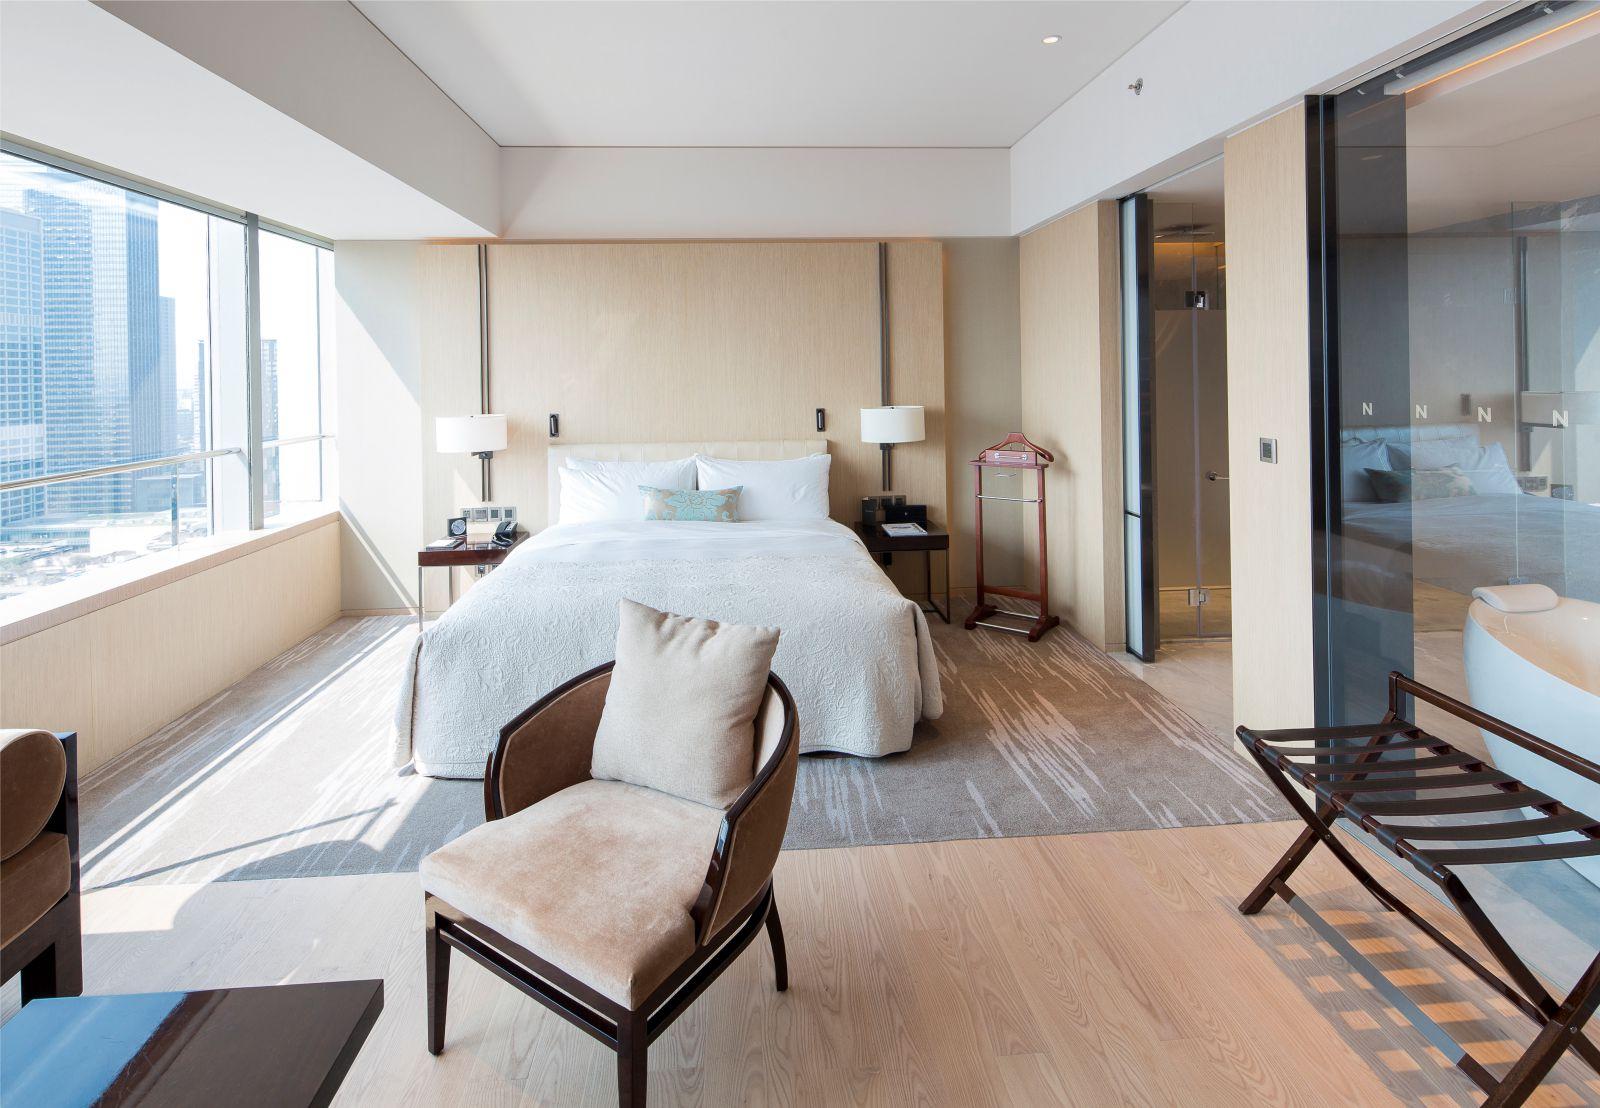 Reinvigorating hospitality